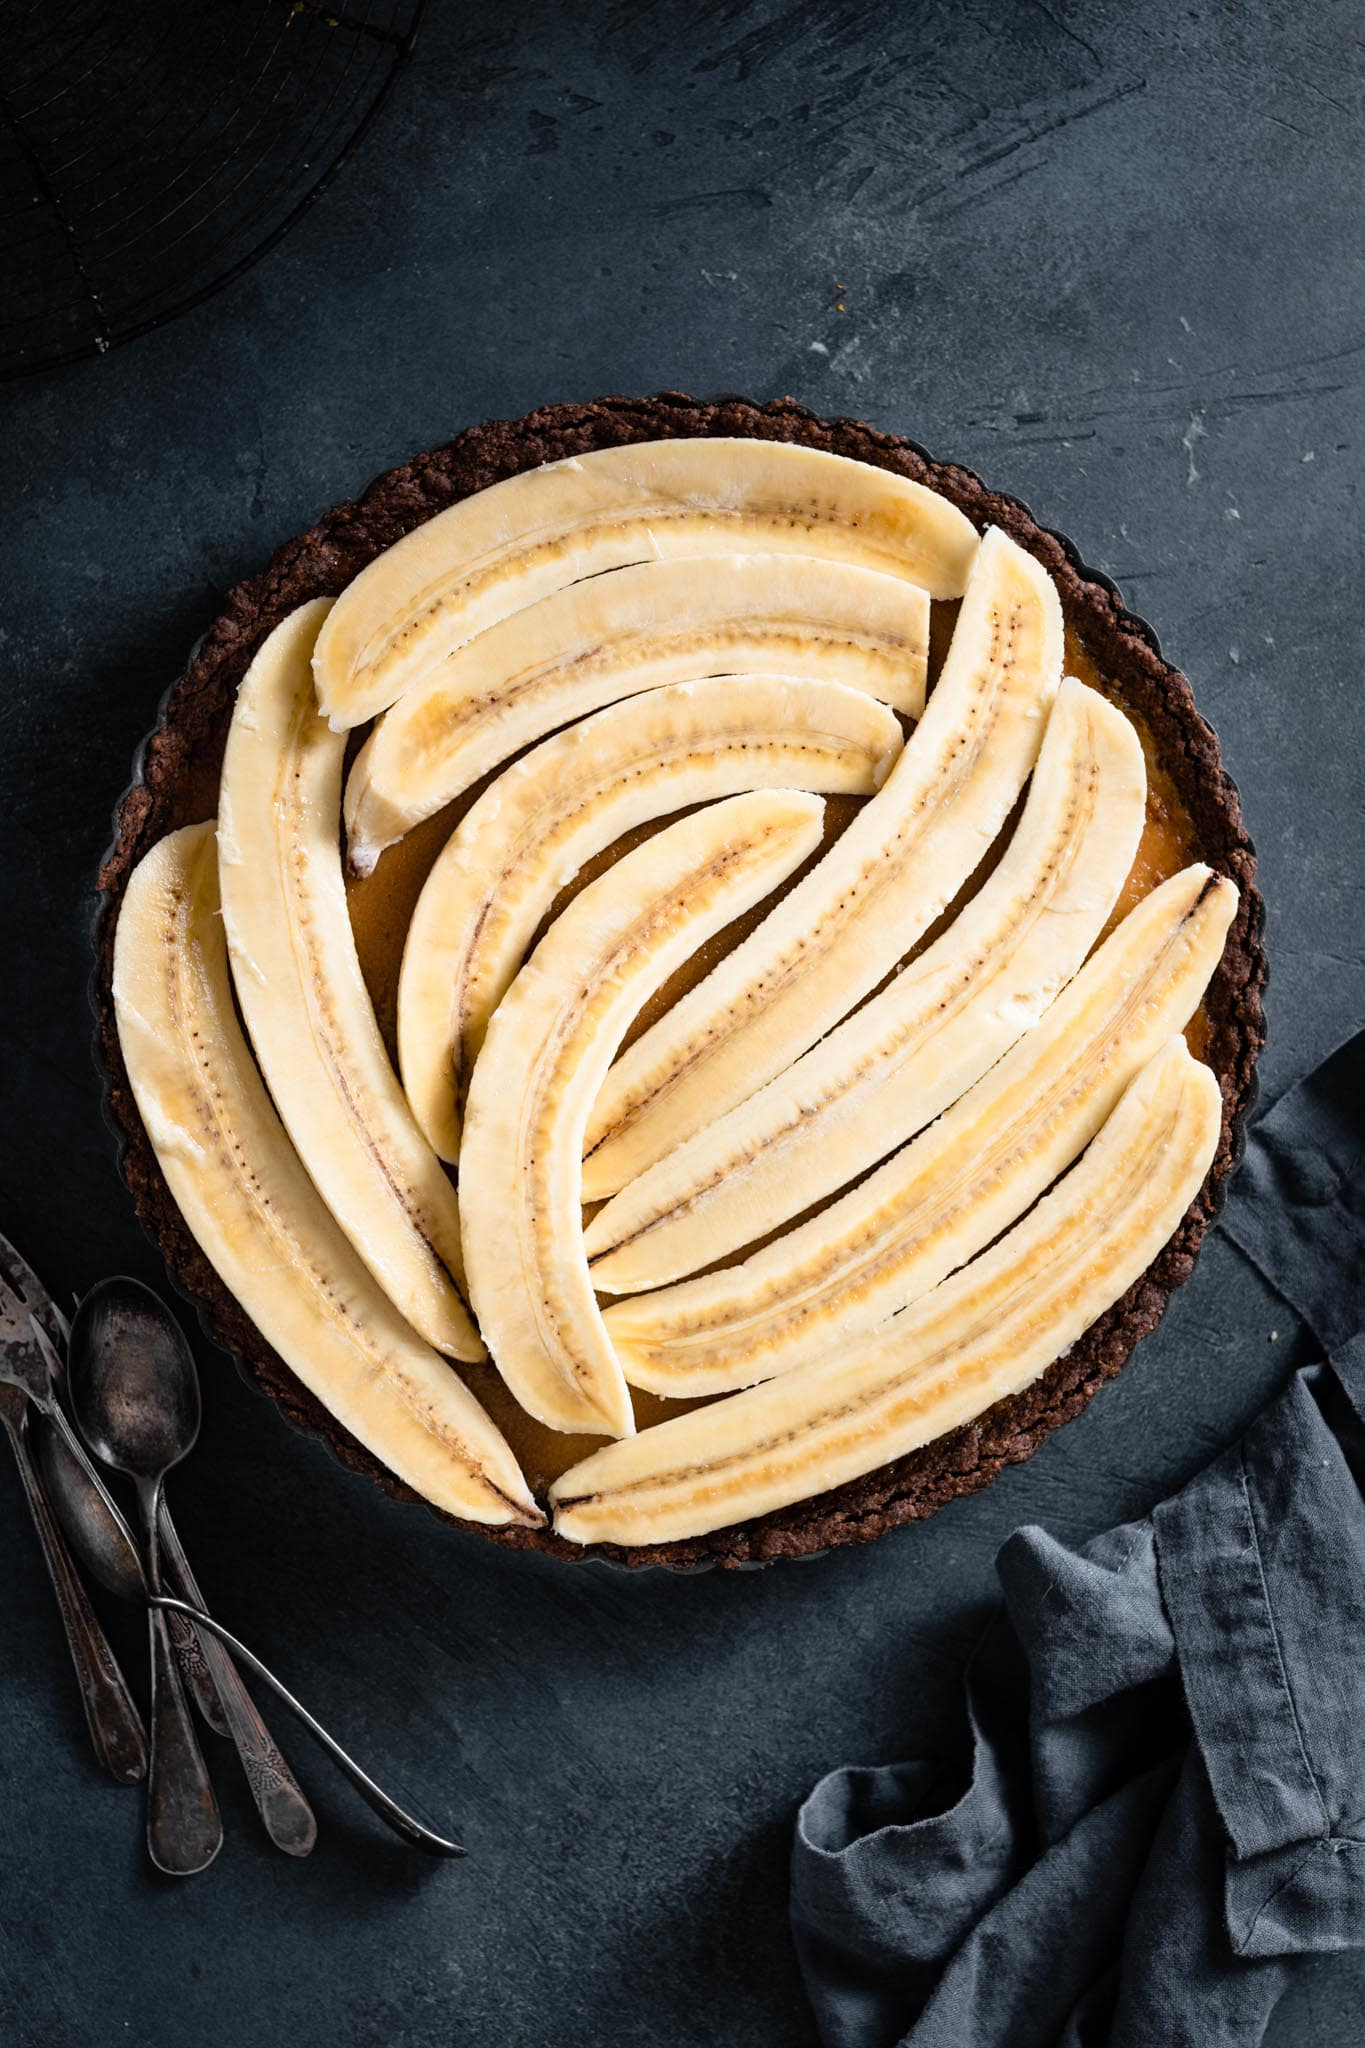 Banana tart with a chocolate coconut crust.